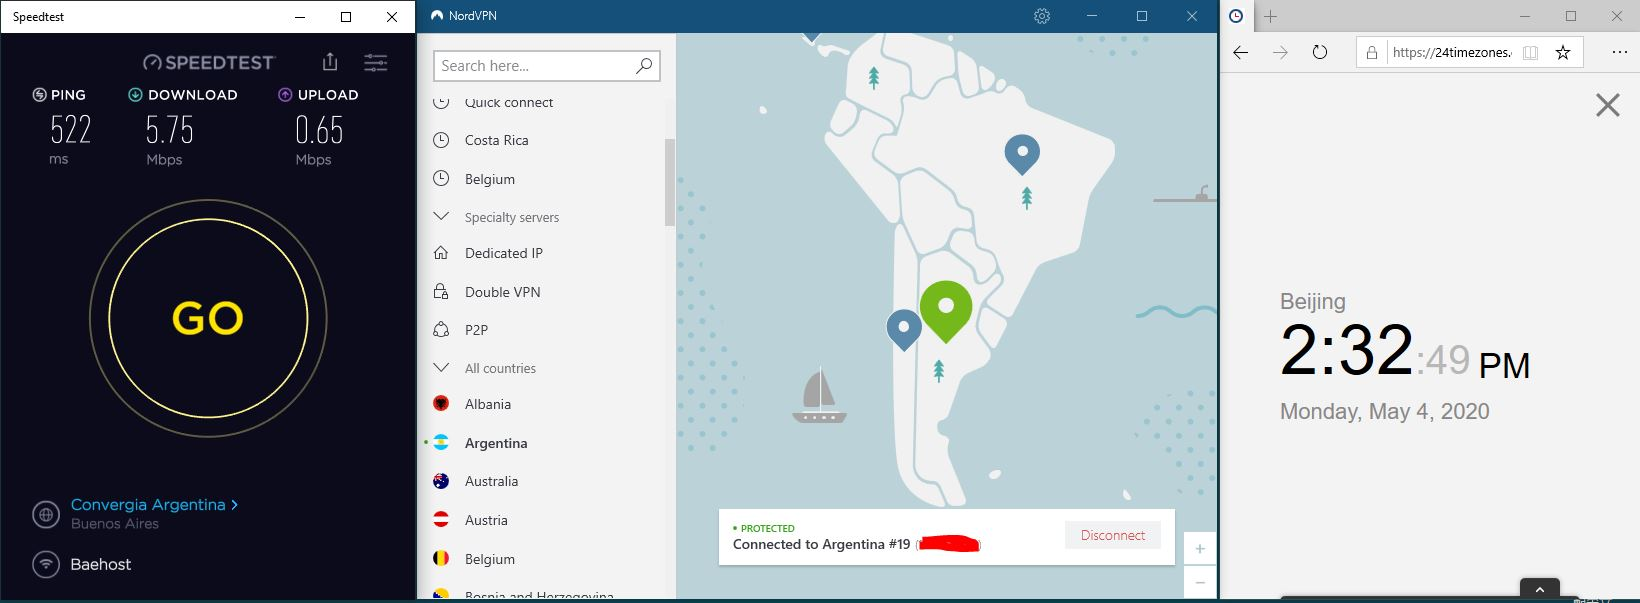 Windows10 NordVPN 混淆协议关闭 Argentina #19 中国VPN 翻墙 科学上网 SpeedTest测速-20200504